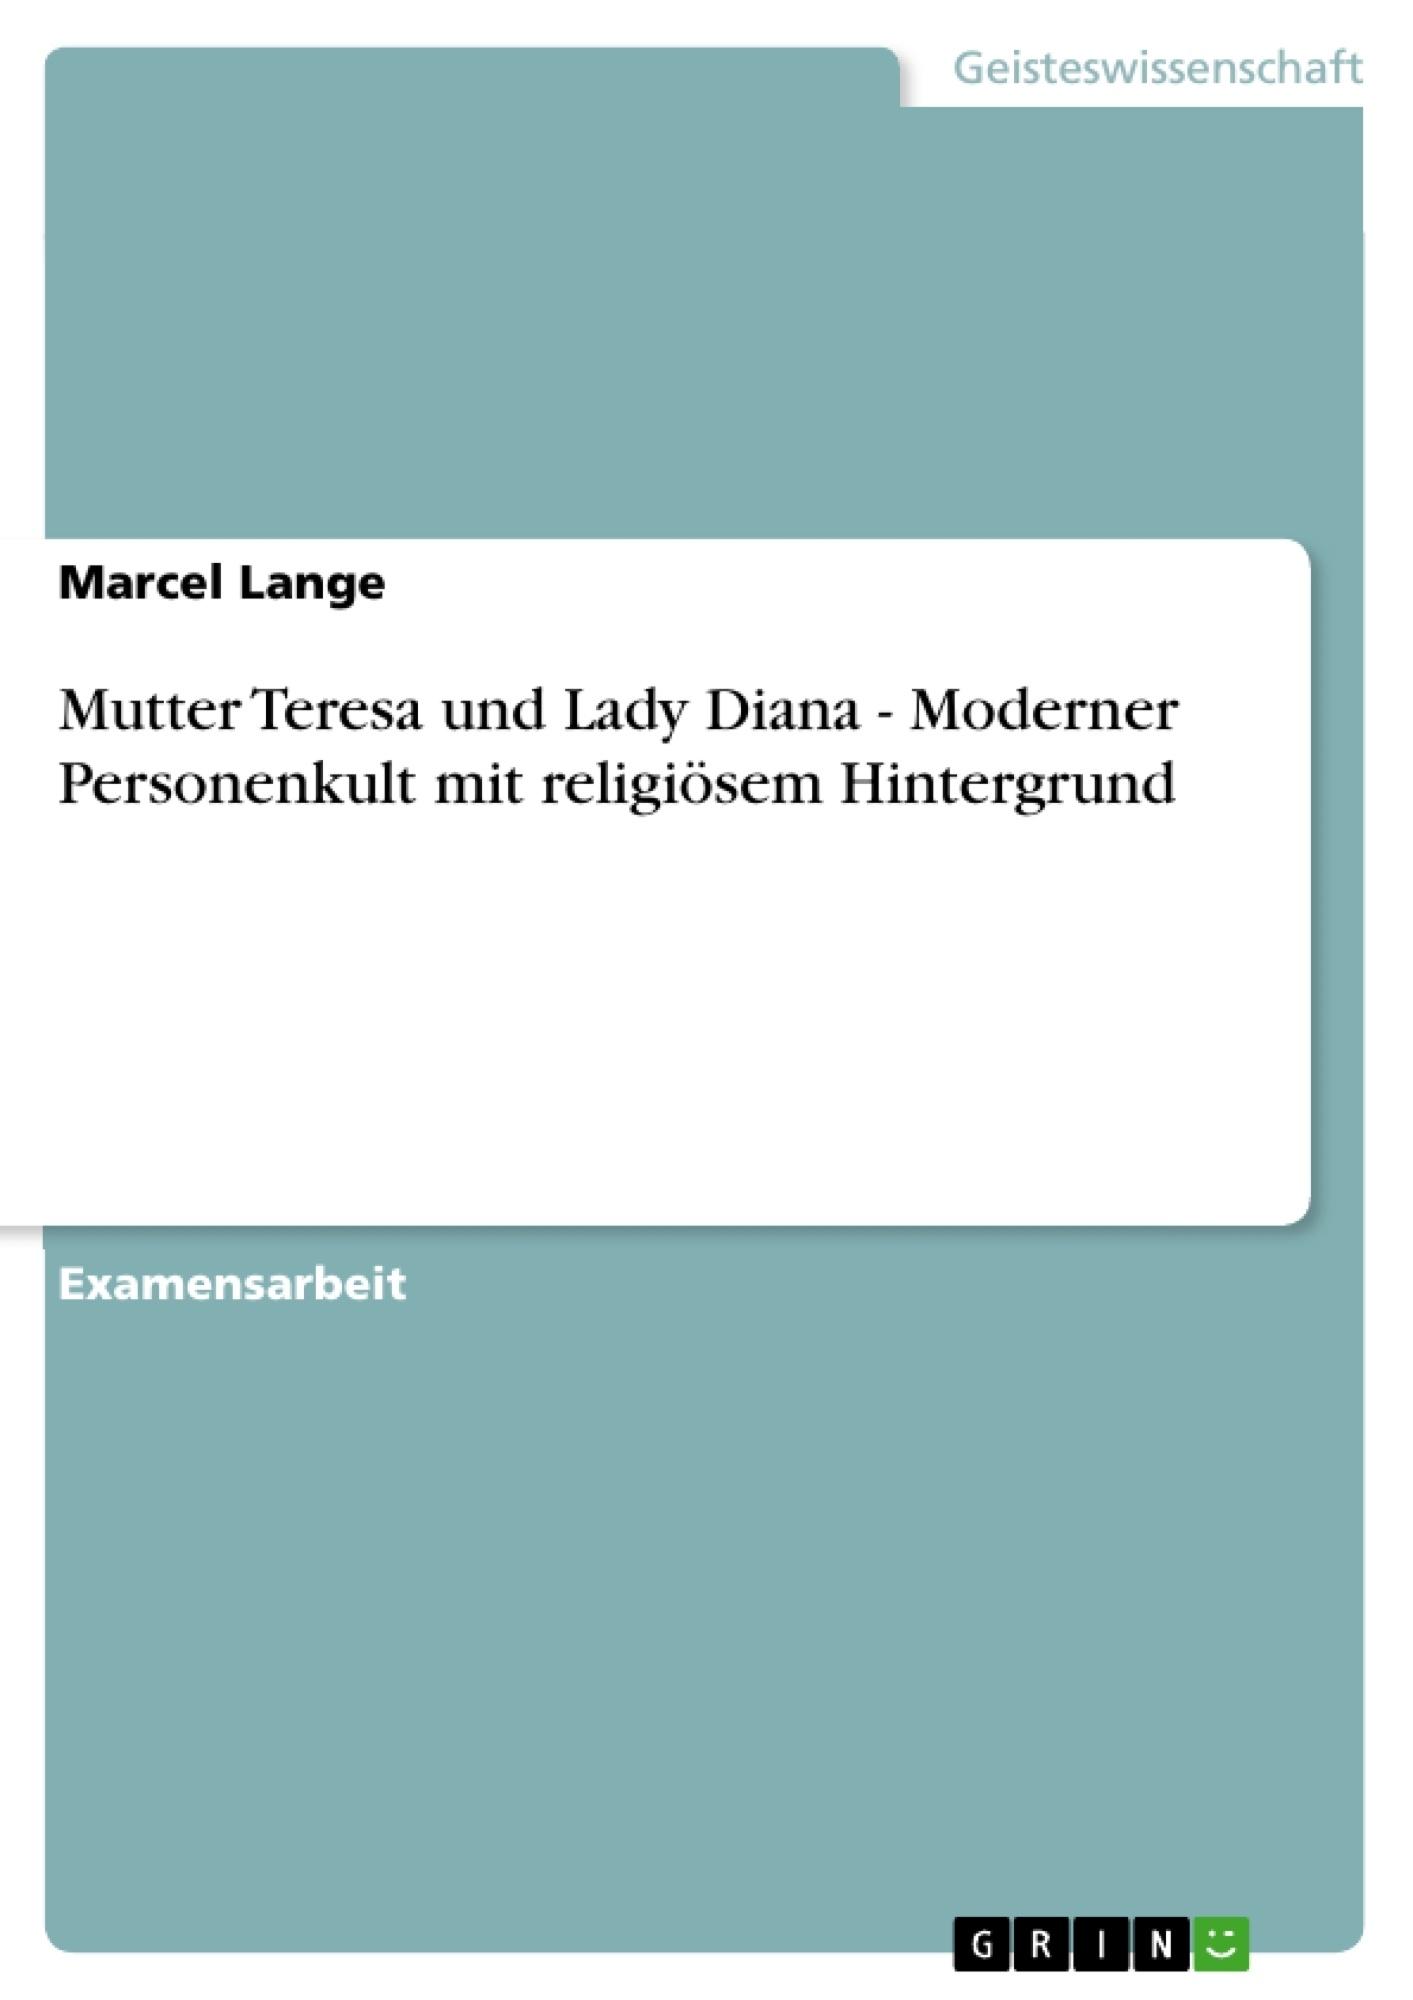 Dorable Hospiz Management Lebenslauf Ensign - FORTSETZUNG ...